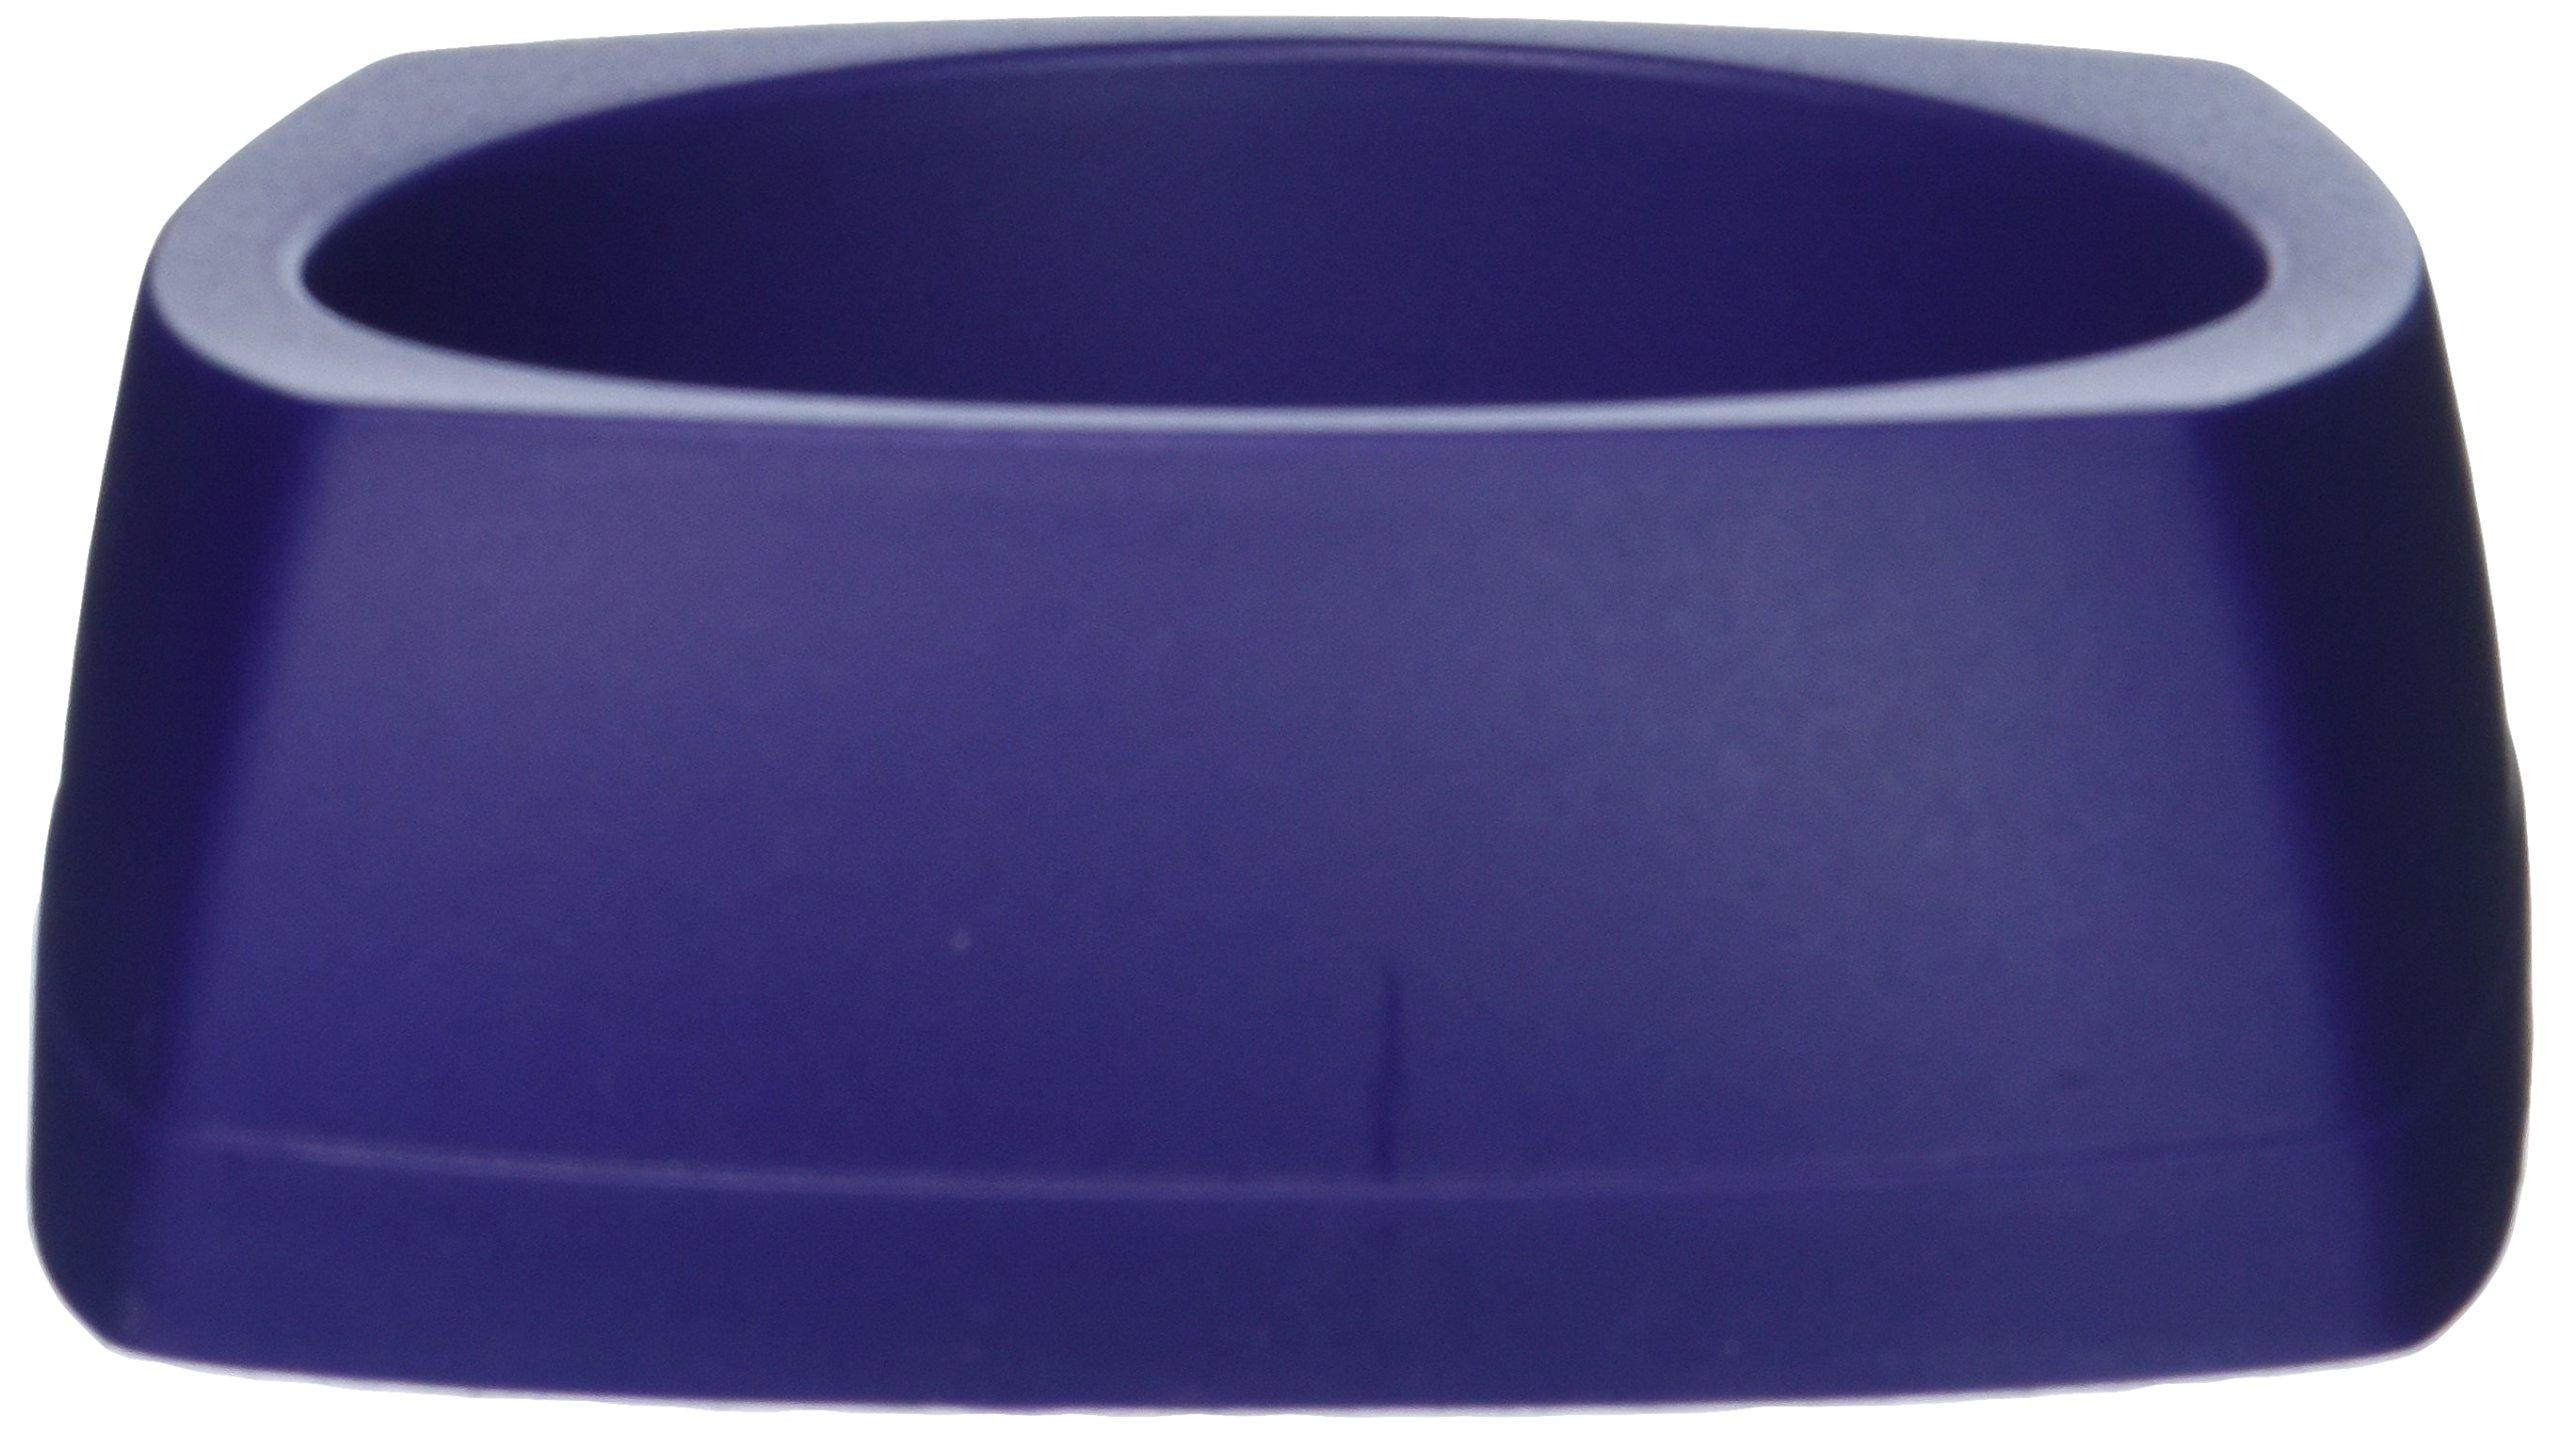 Lixit Nibble Food Bowl, Large